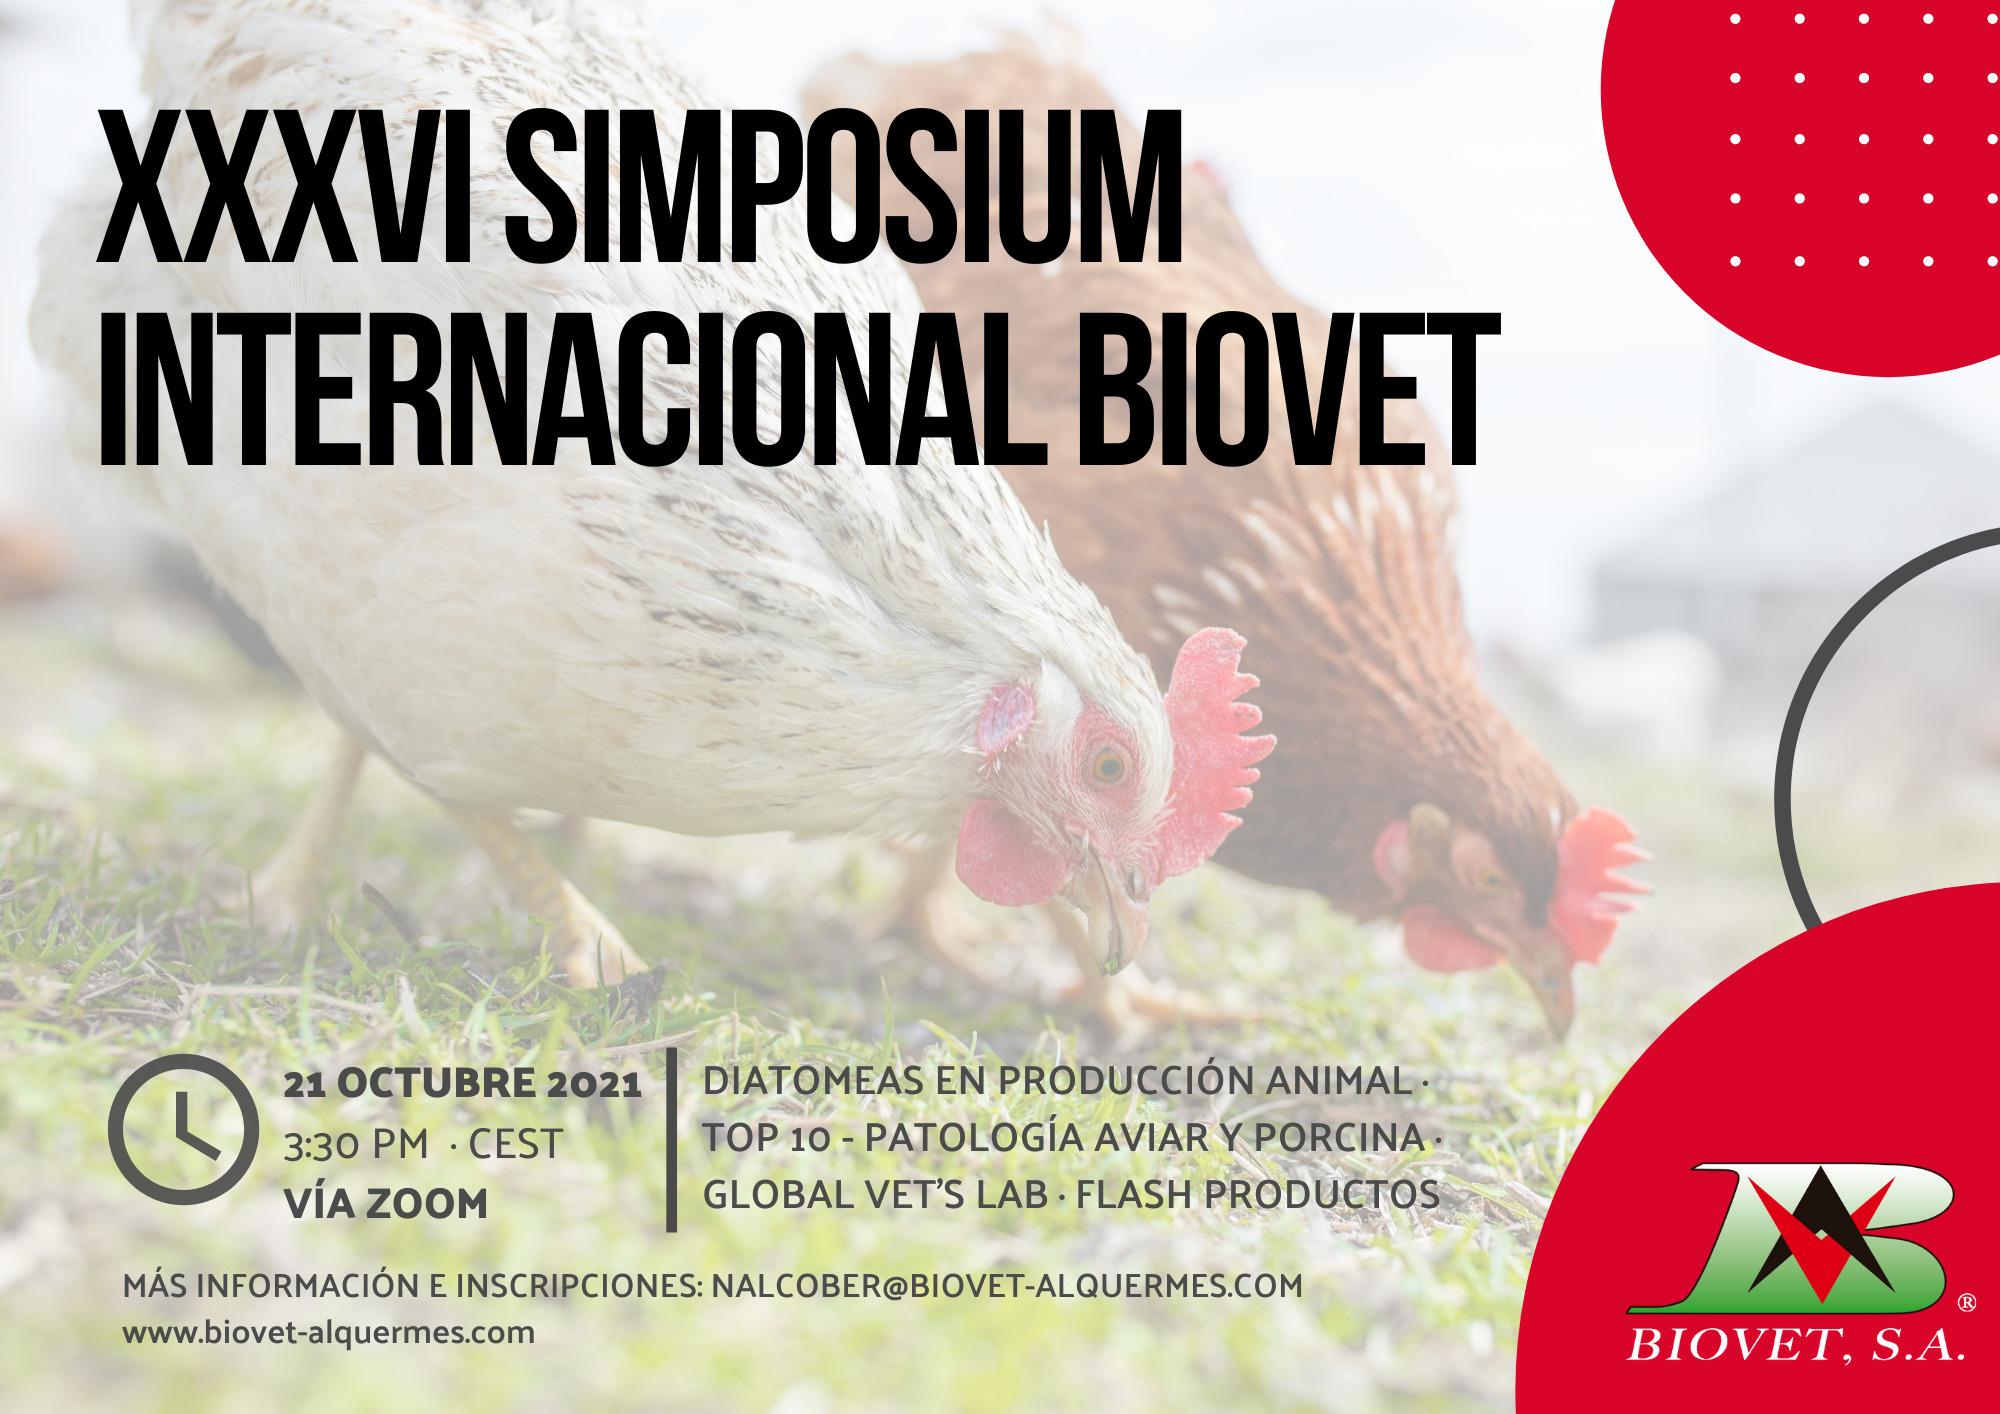 Simposium Internacional Biovet